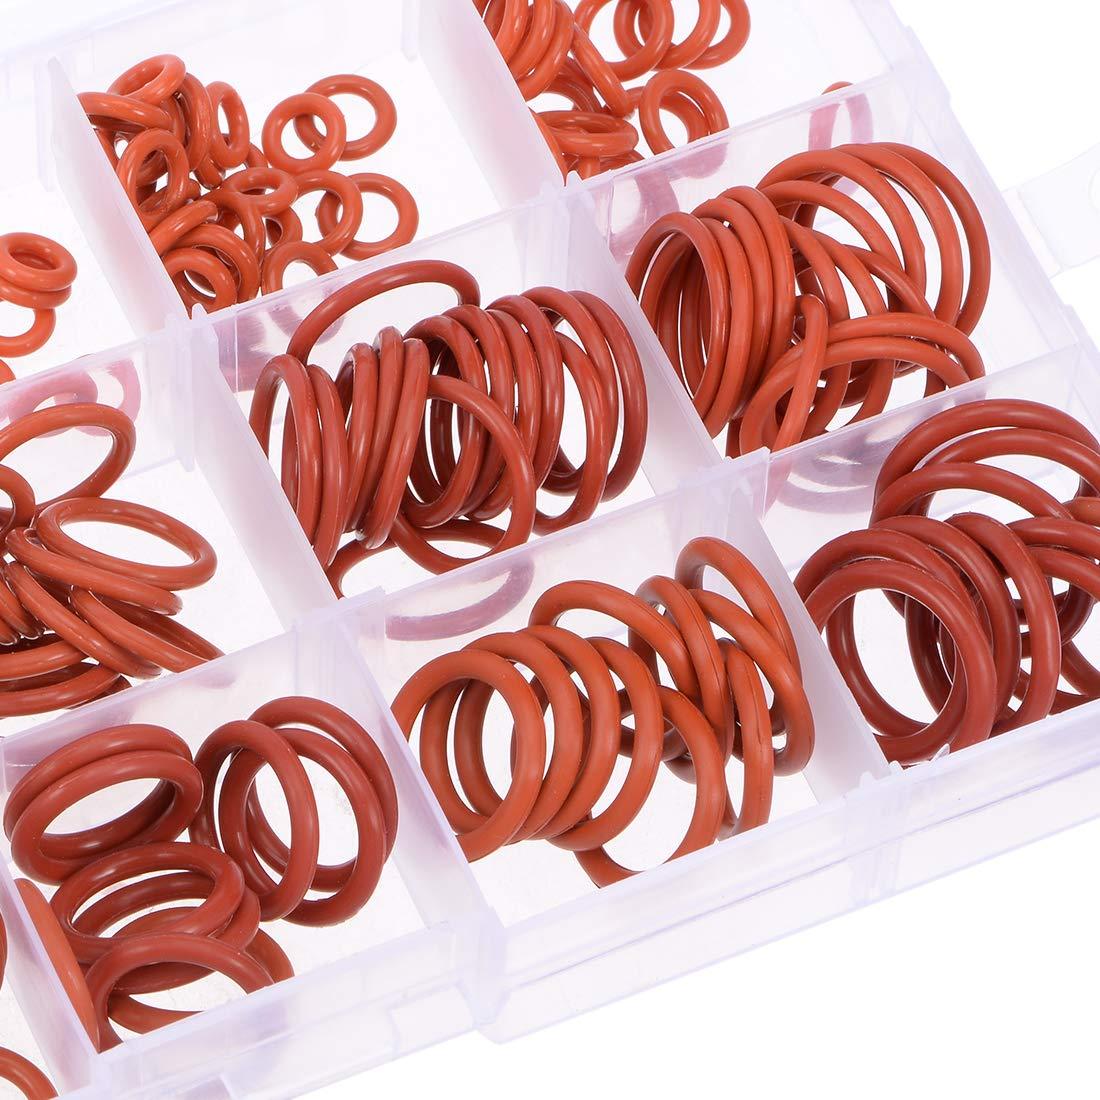 Rubber O-Rings Kit Schwarz 200 Sourcing Map O-Ring-Sortiment metrisches Dichtungsring-Set f/ür Sanit/är und Automobil-Reparatur